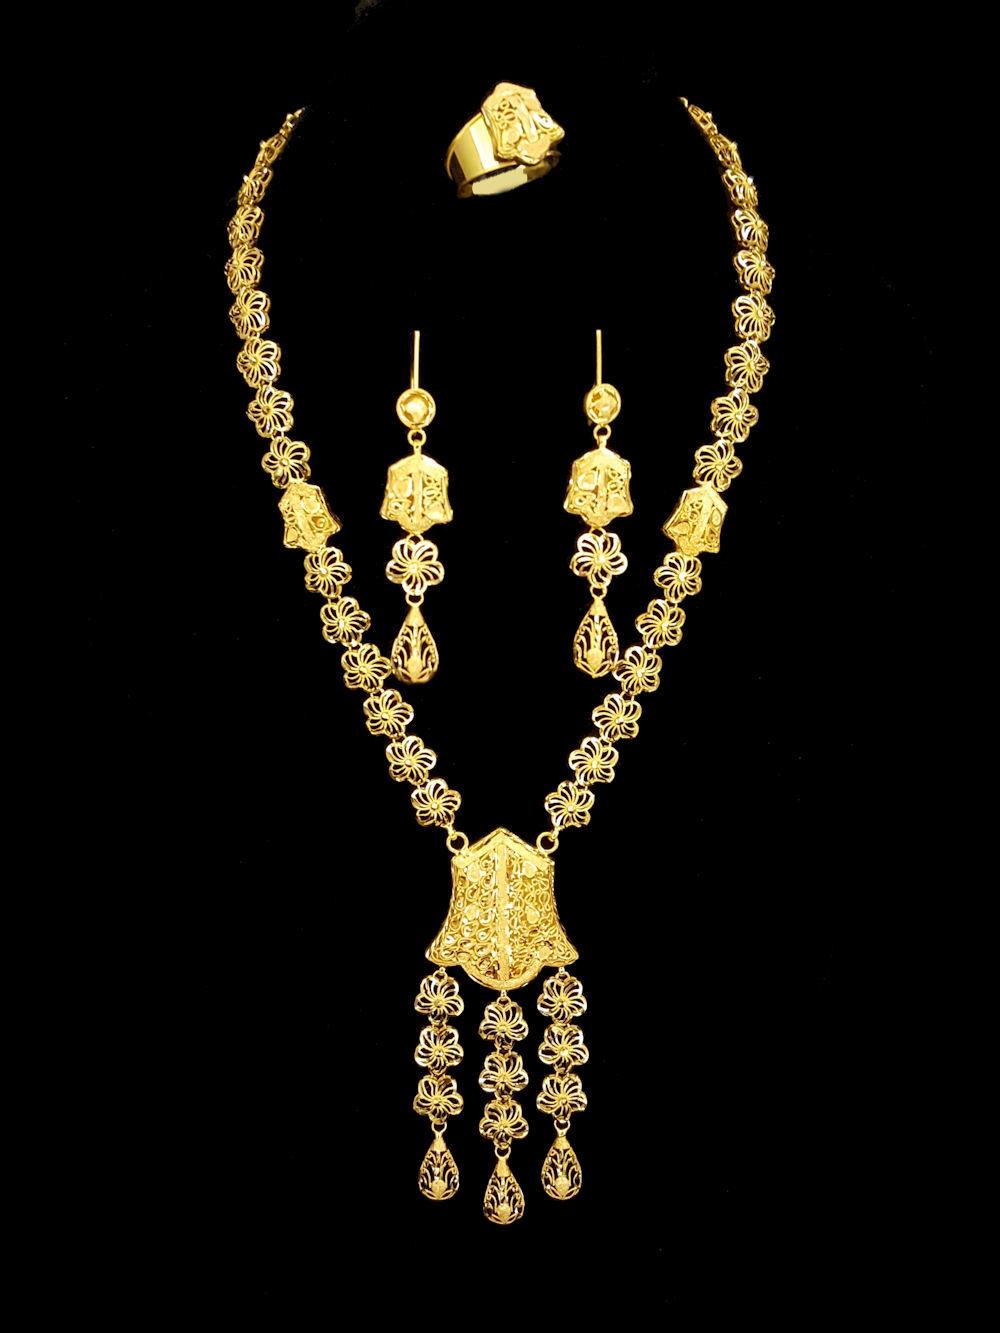 Arabic 21k Gold Jewelry Jewelry FlatHeadlake3on3